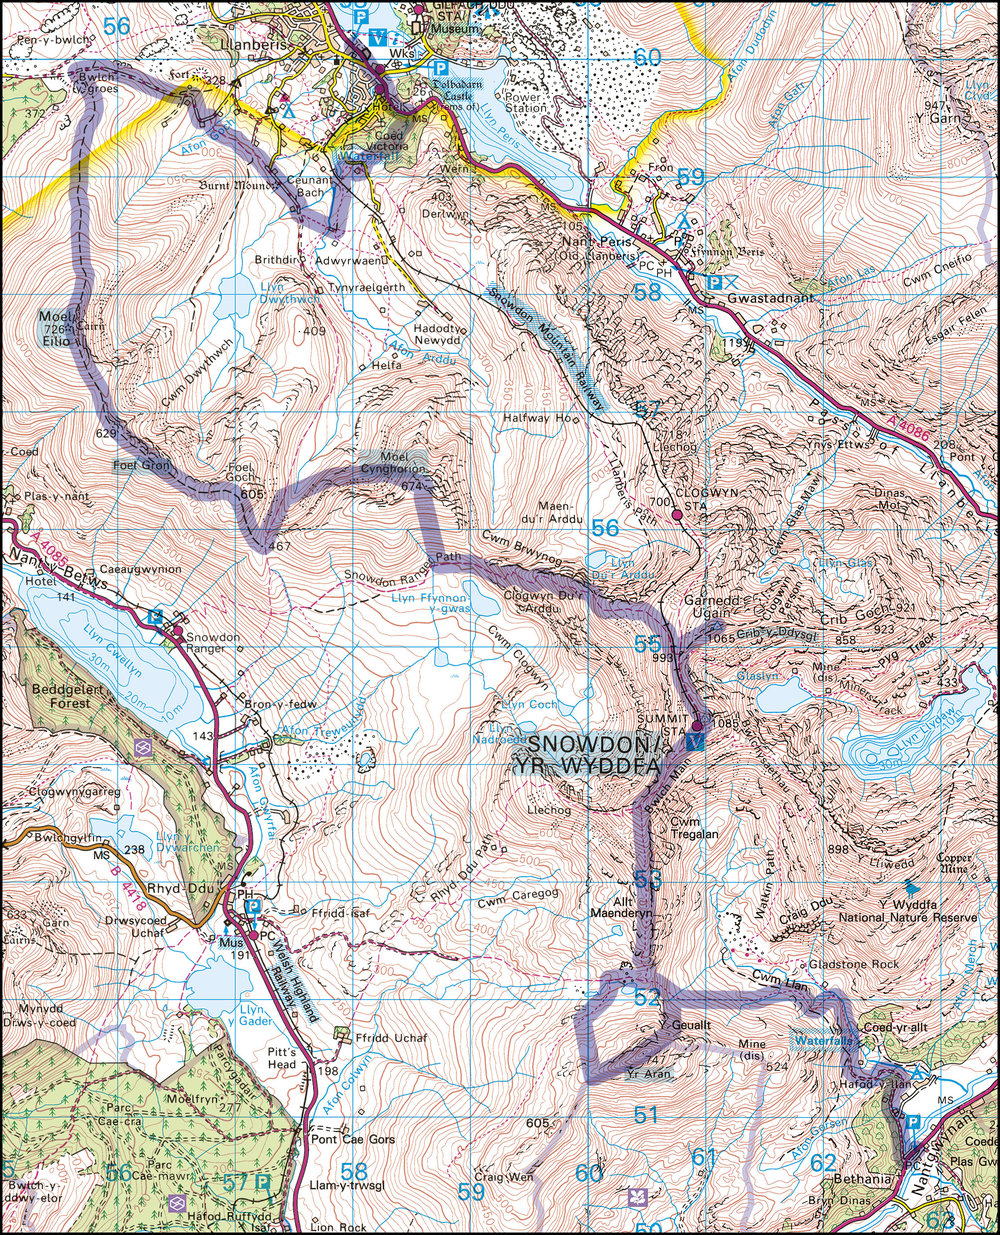 22_TAB  12_Snowdonia Leg 2_v2.jpg